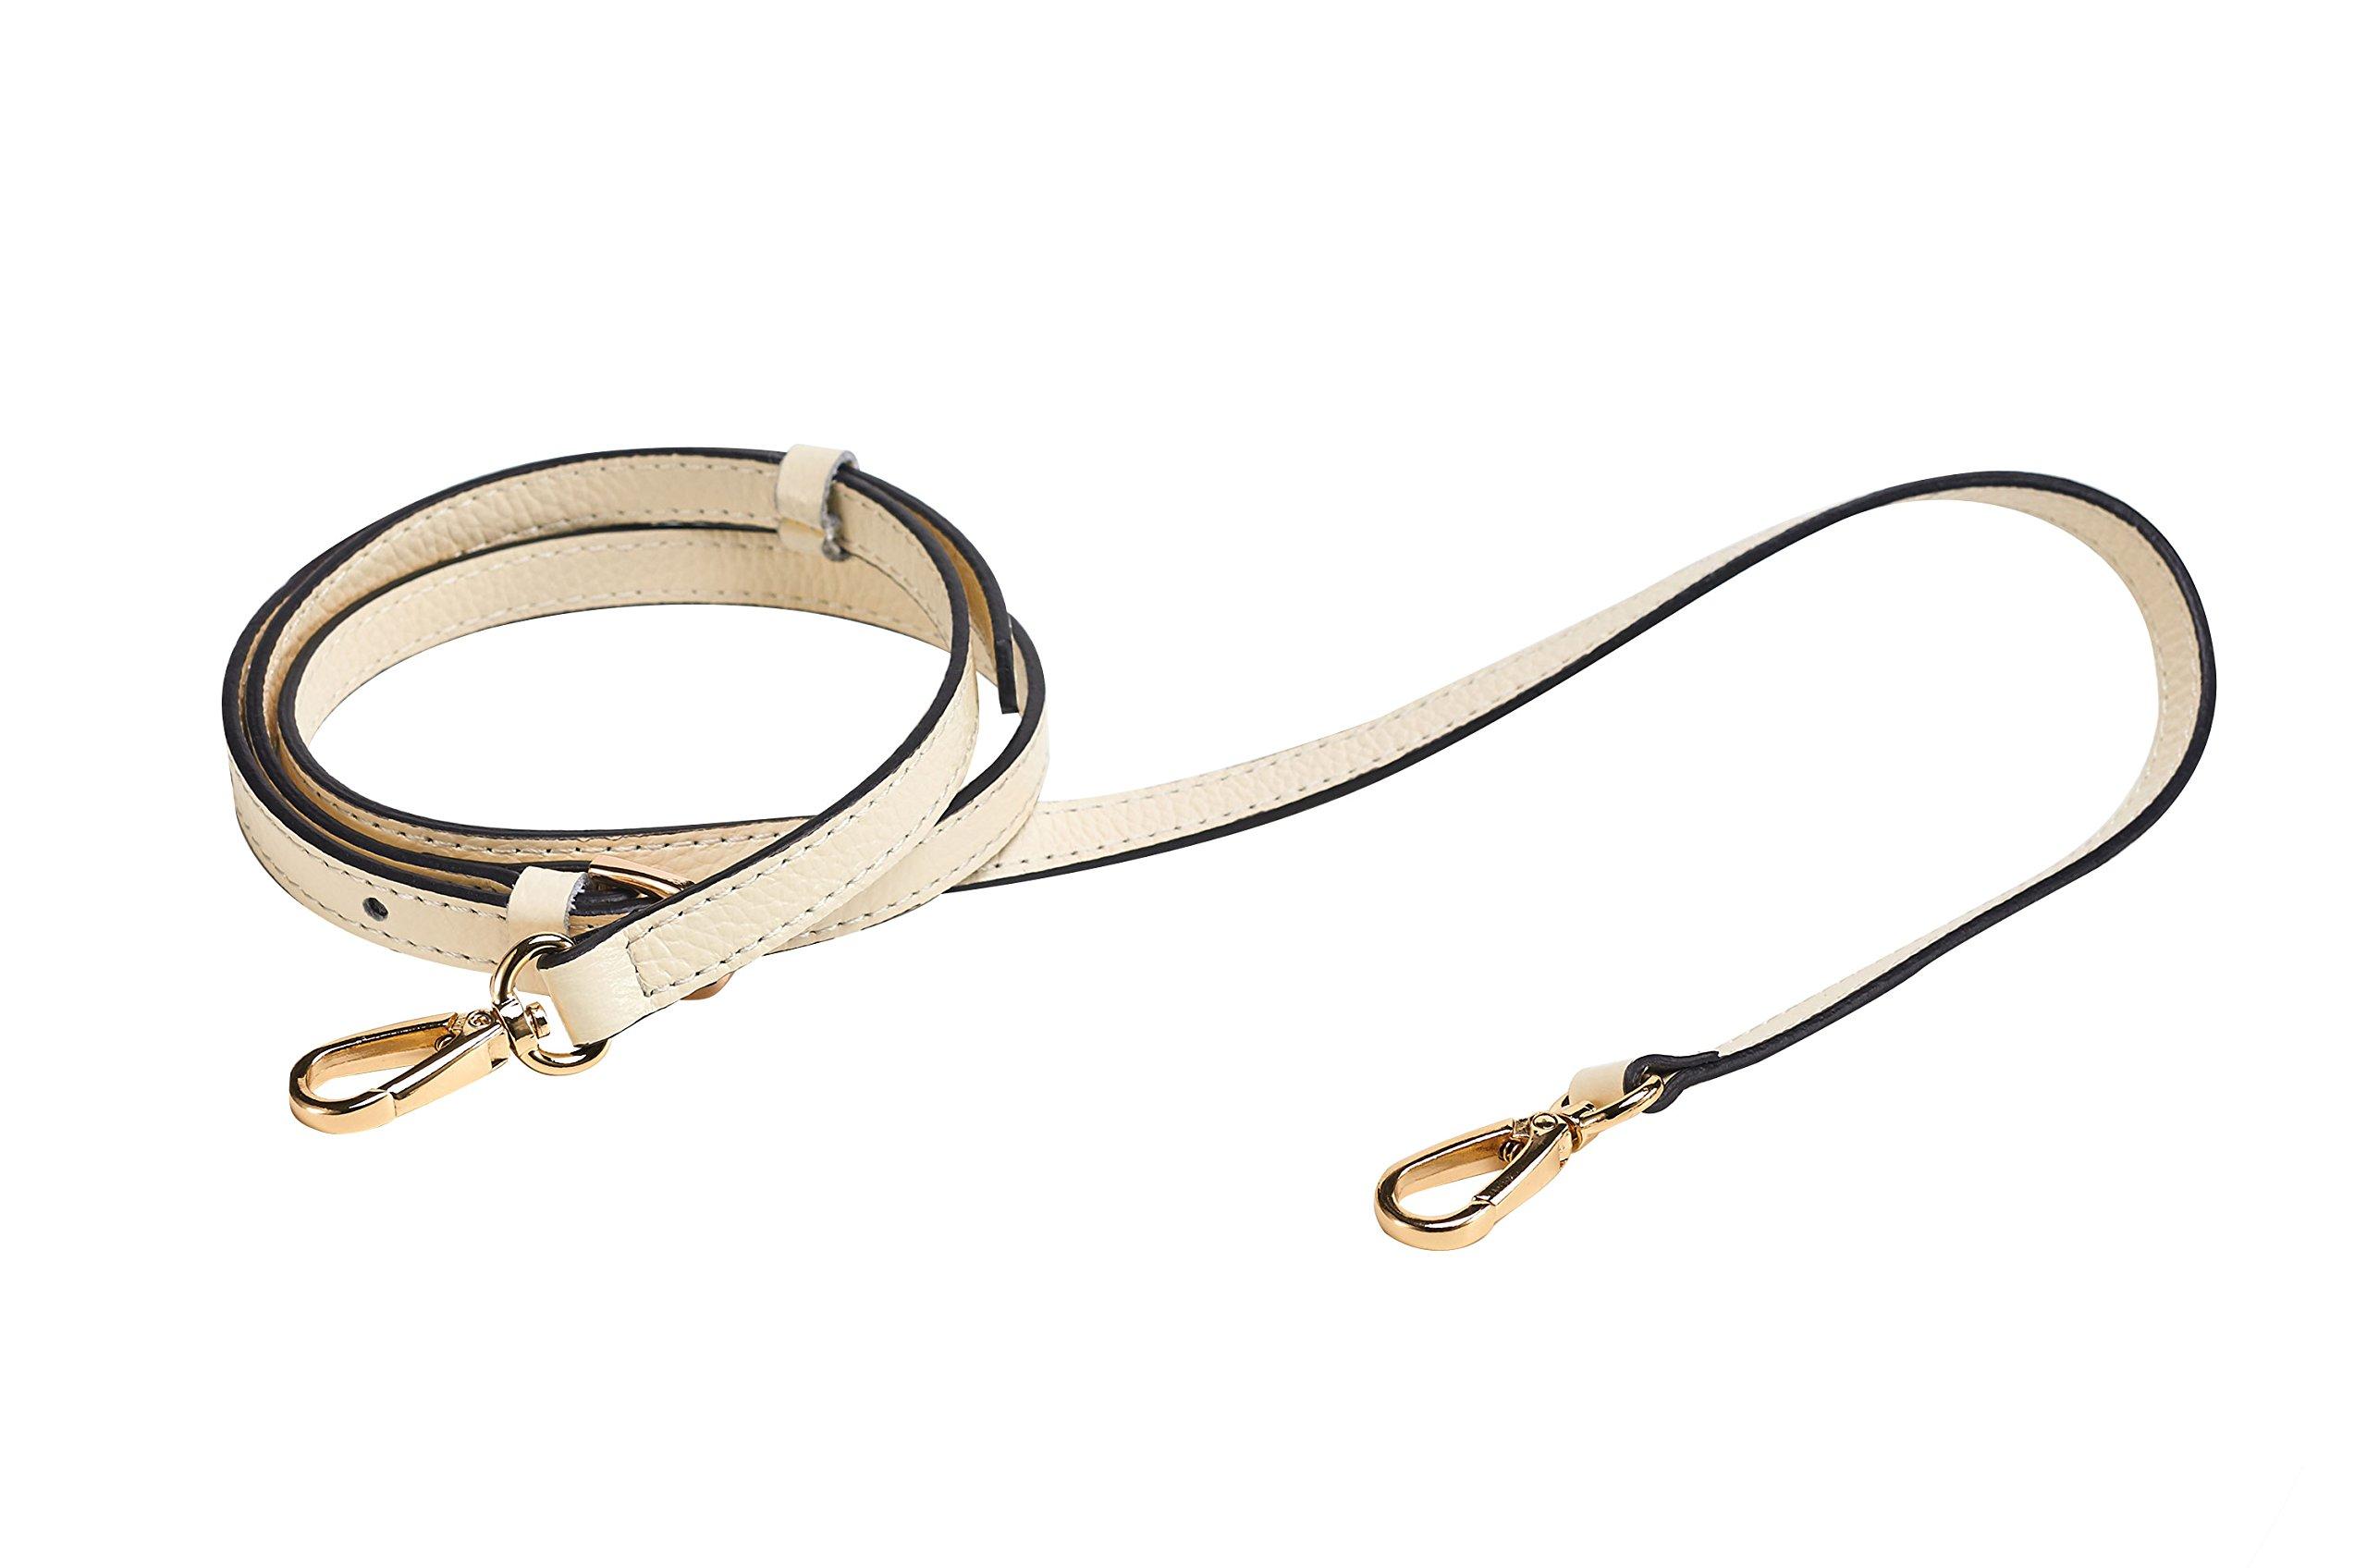 Beige 26-51 inch Gold Hardware 1.8 cm Width VanEnjoy Full Grain Leather Adjustable Replacement Strap Cross Body Bag Purse